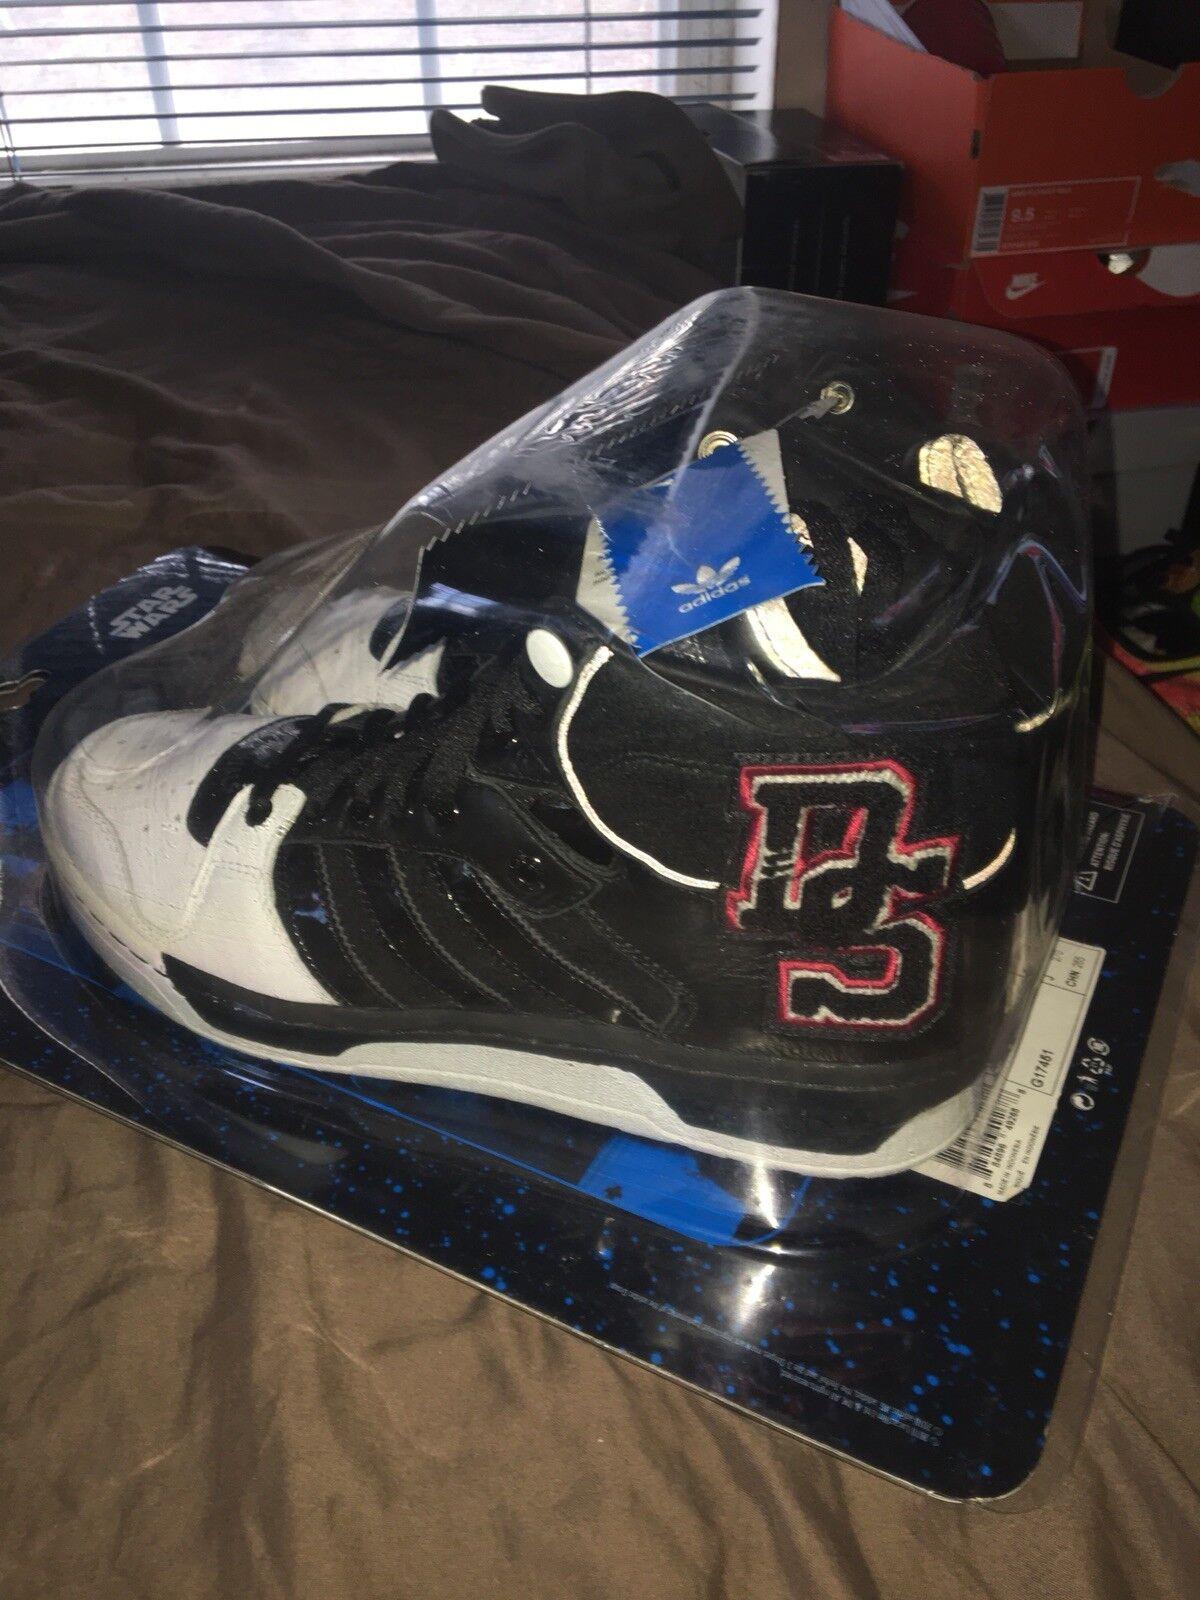 Adidas Star Wars Conductor Hi Super Death Rare Nike Sb Jordan 1, 2, 3, 4, 5, Lot